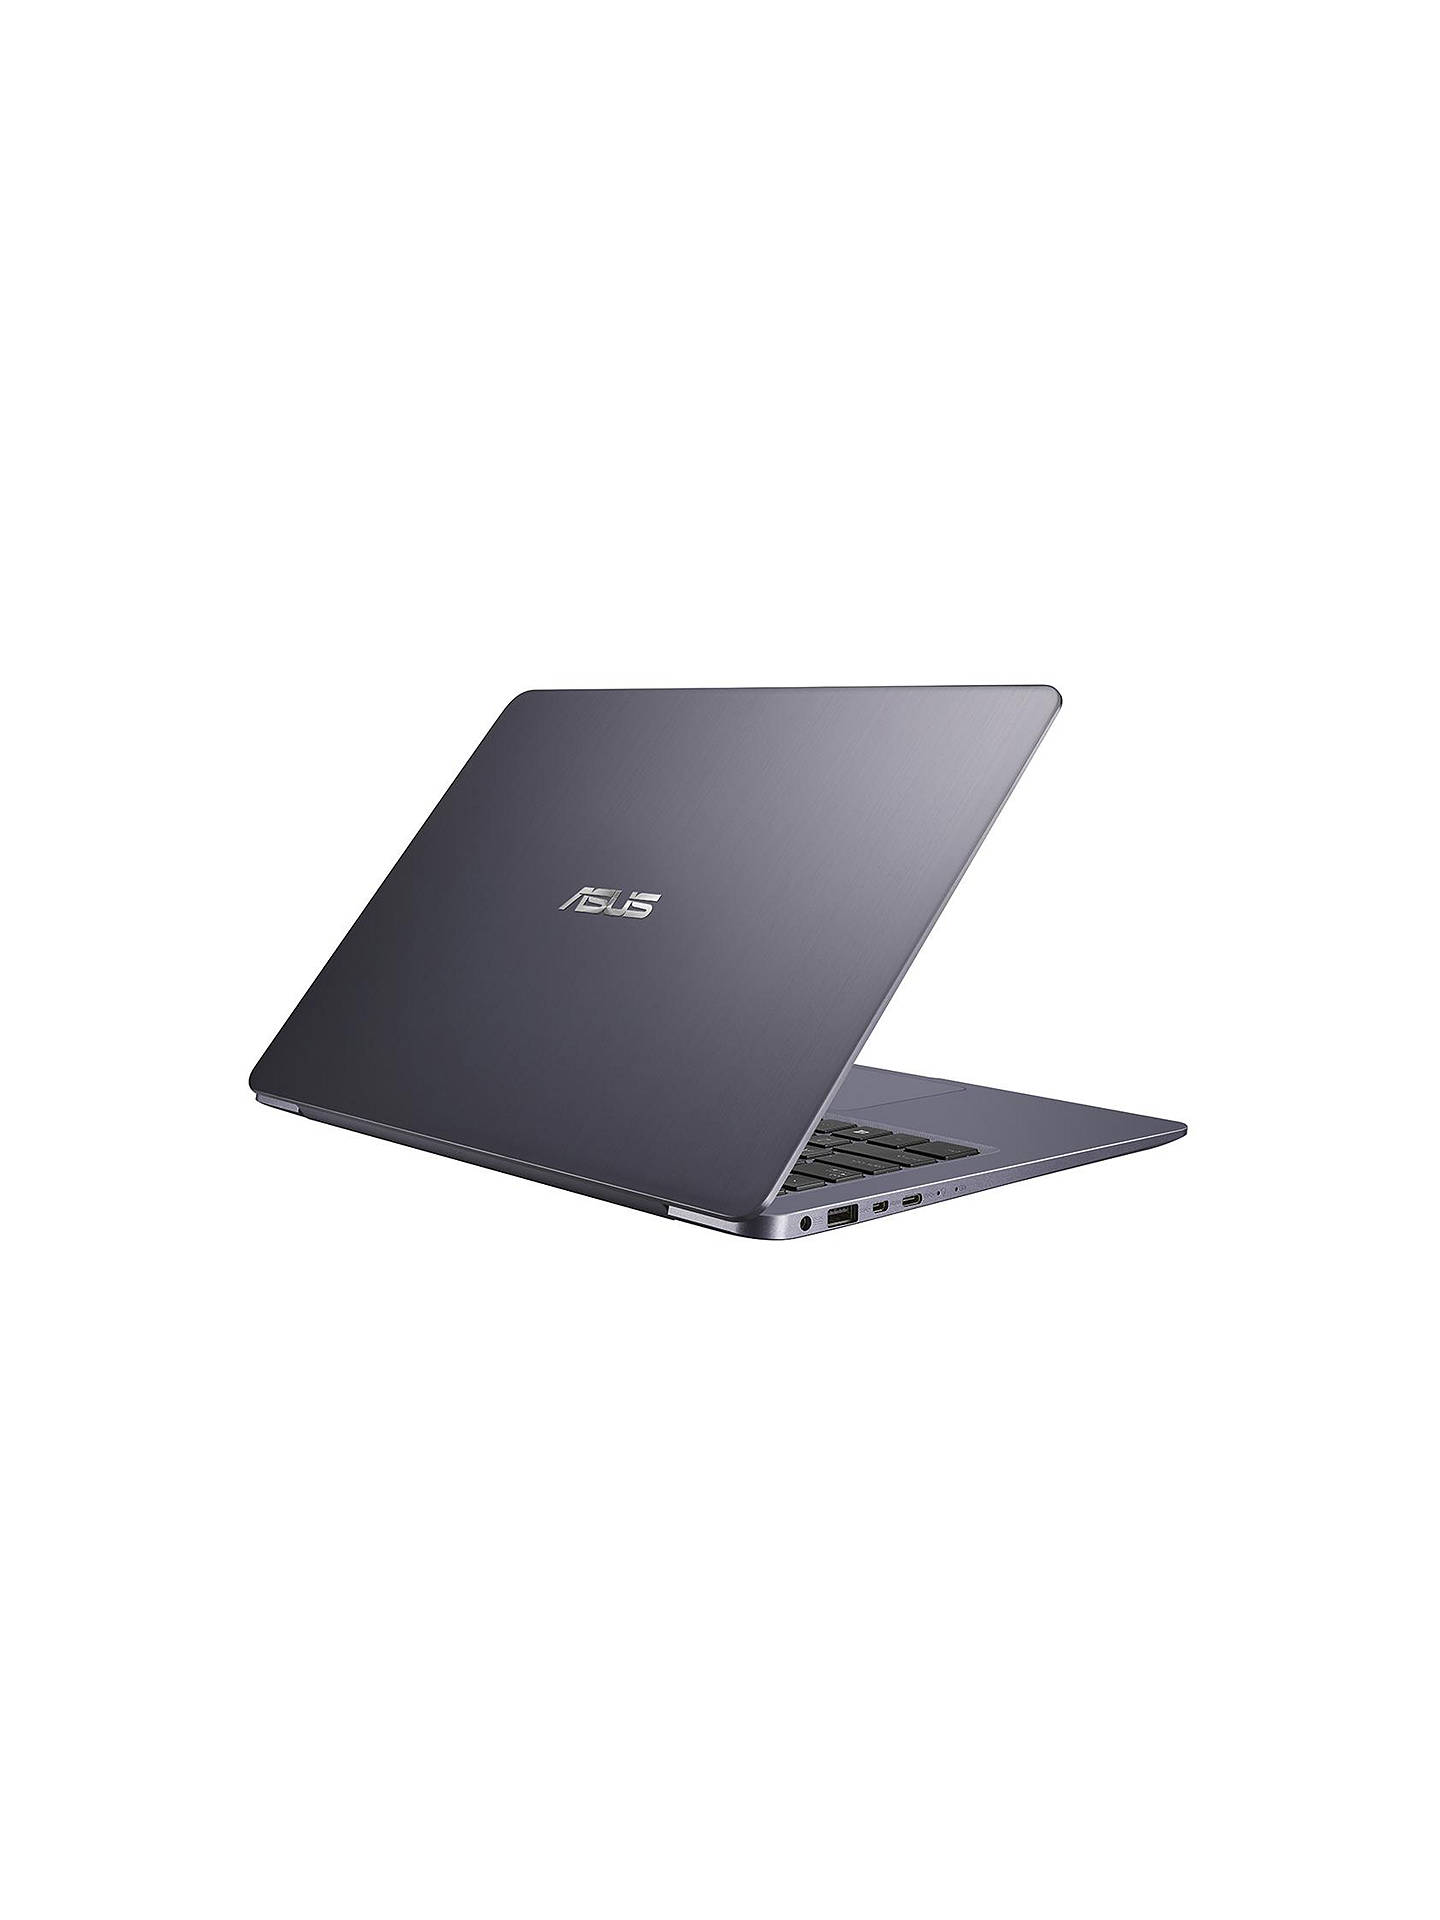 "ASUS VivoBook S14 S406UA-BM290T Laptop, Intel Core i3, 4GB RAM, 256GB SSD,  14 1"", Full HD, Grey"